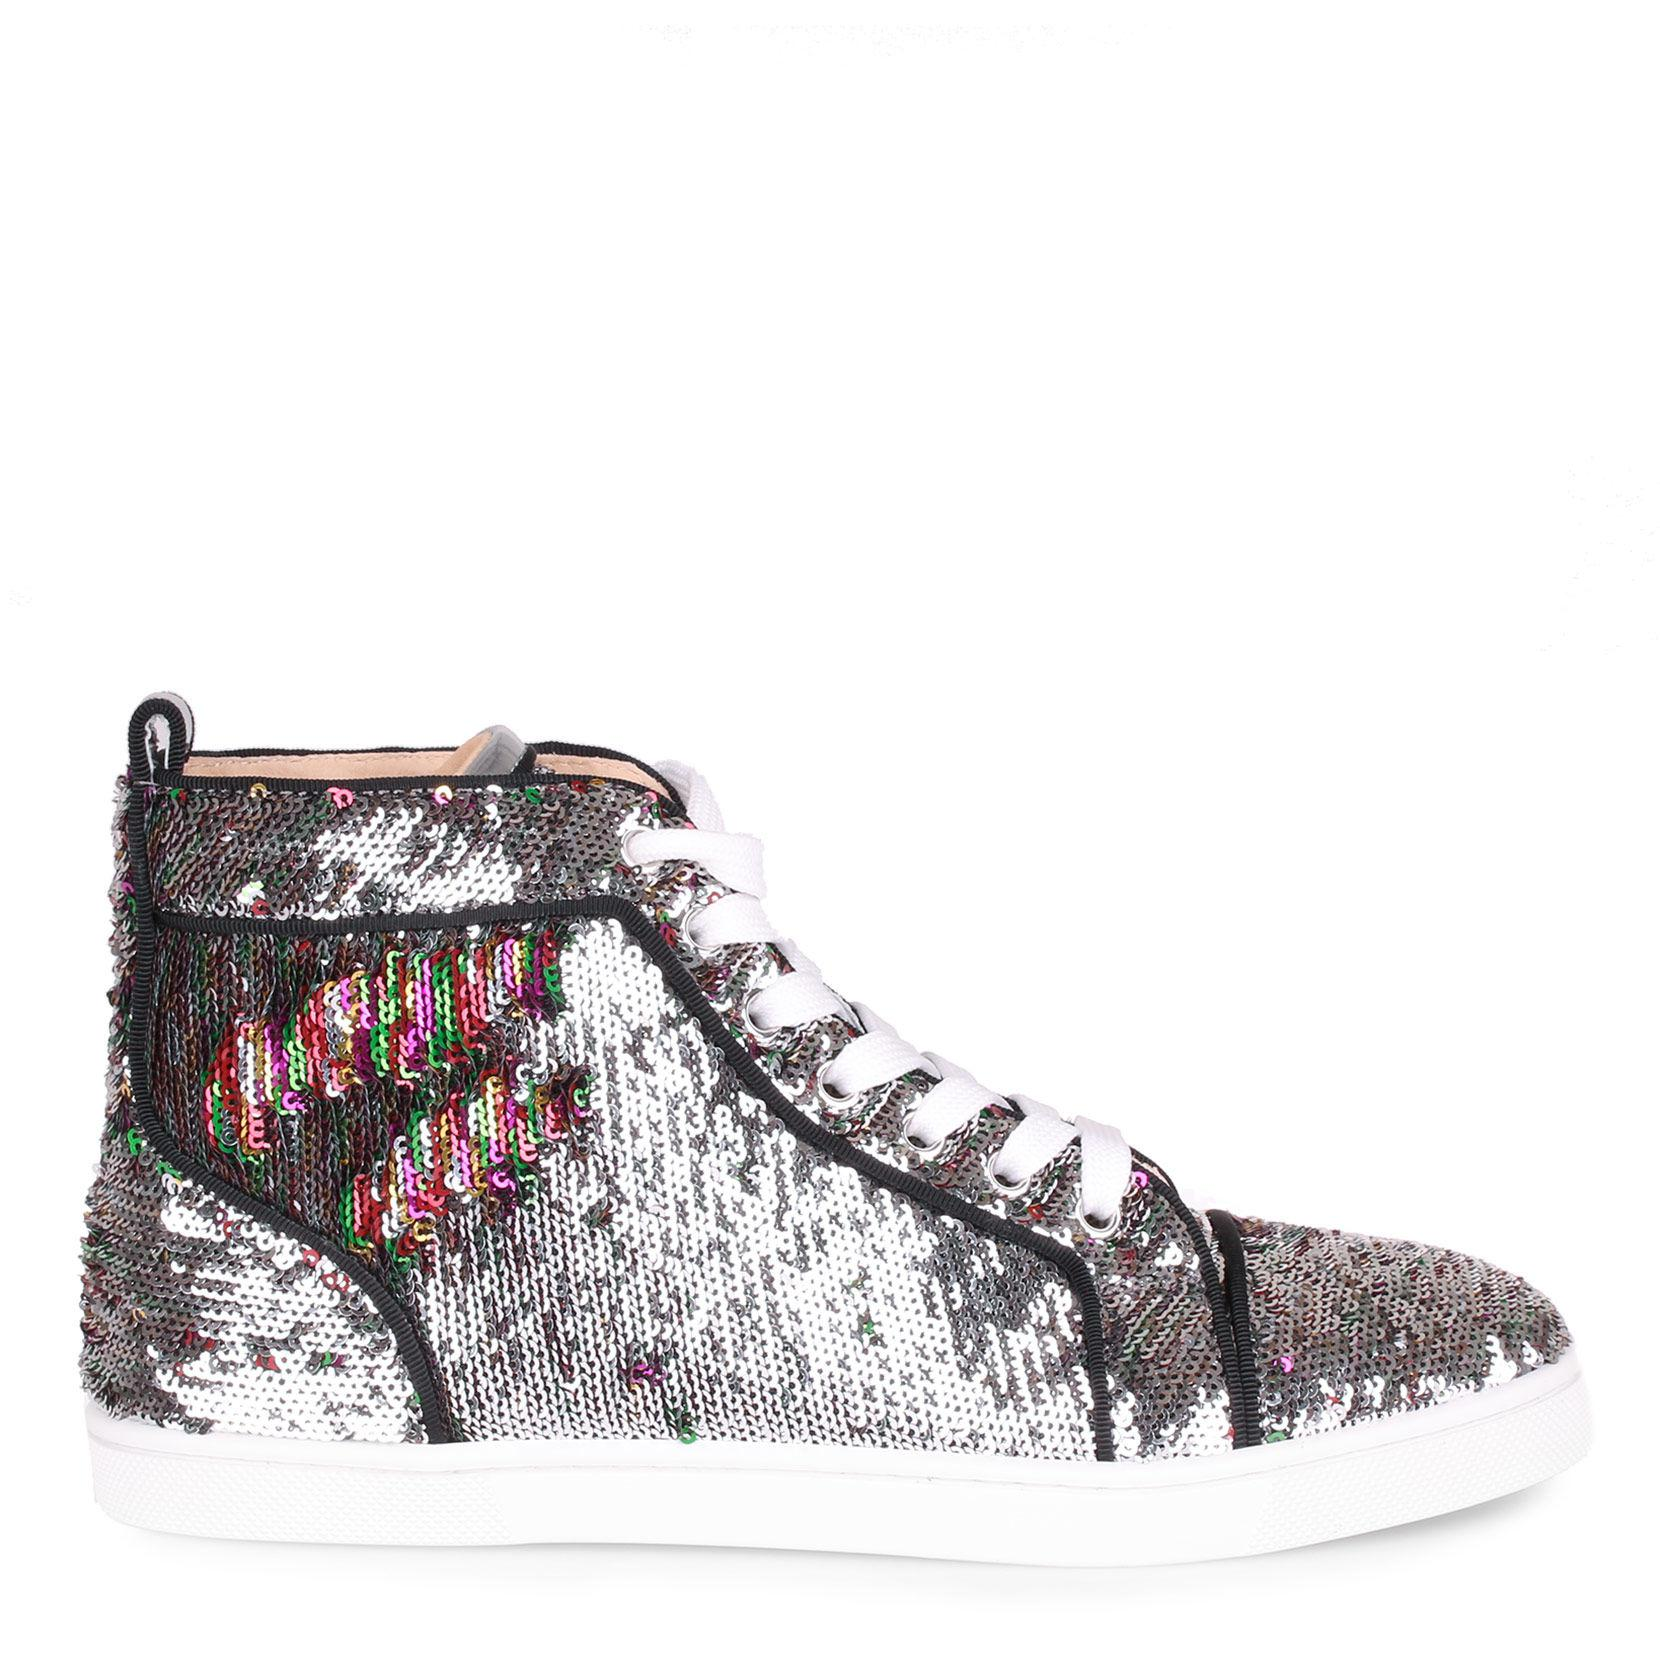 dc226935d069 Christian Louboutin - Metallic Bip Bip Silver Sequin Sneaker - Lyst. View  fullscreen